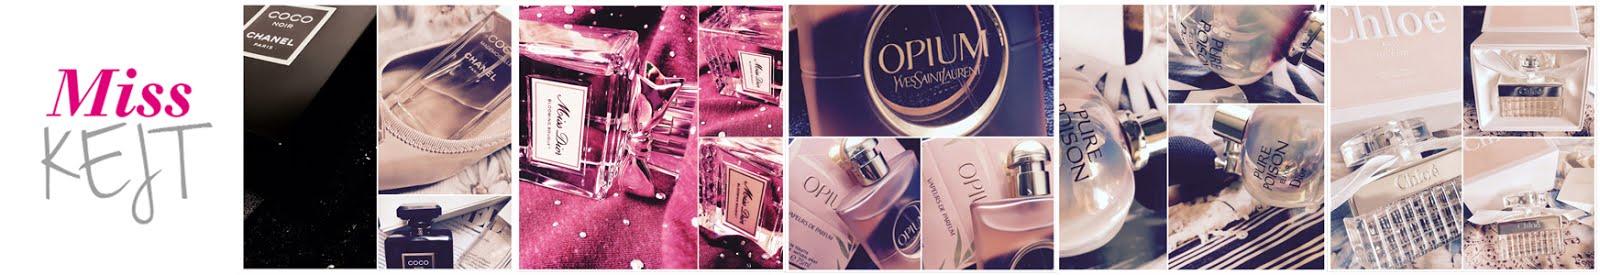 Miss Kejt | blog o perfumach i innych kobiecych tematach